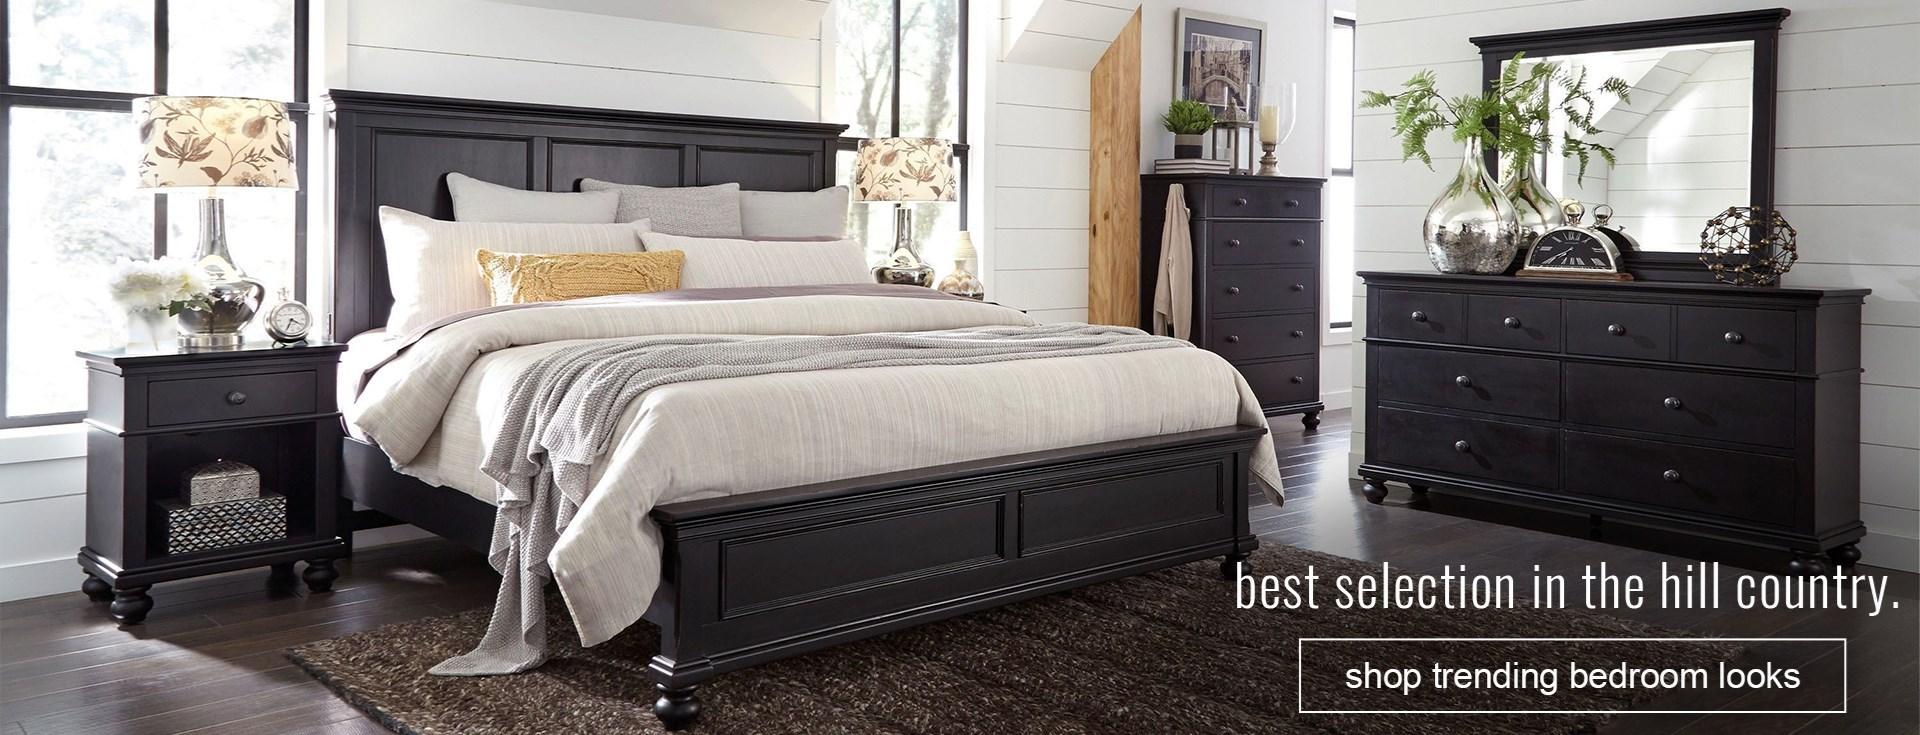 sleep west ga media facebook id poolermattress savannah home mattress sit montgomery crossroad stores